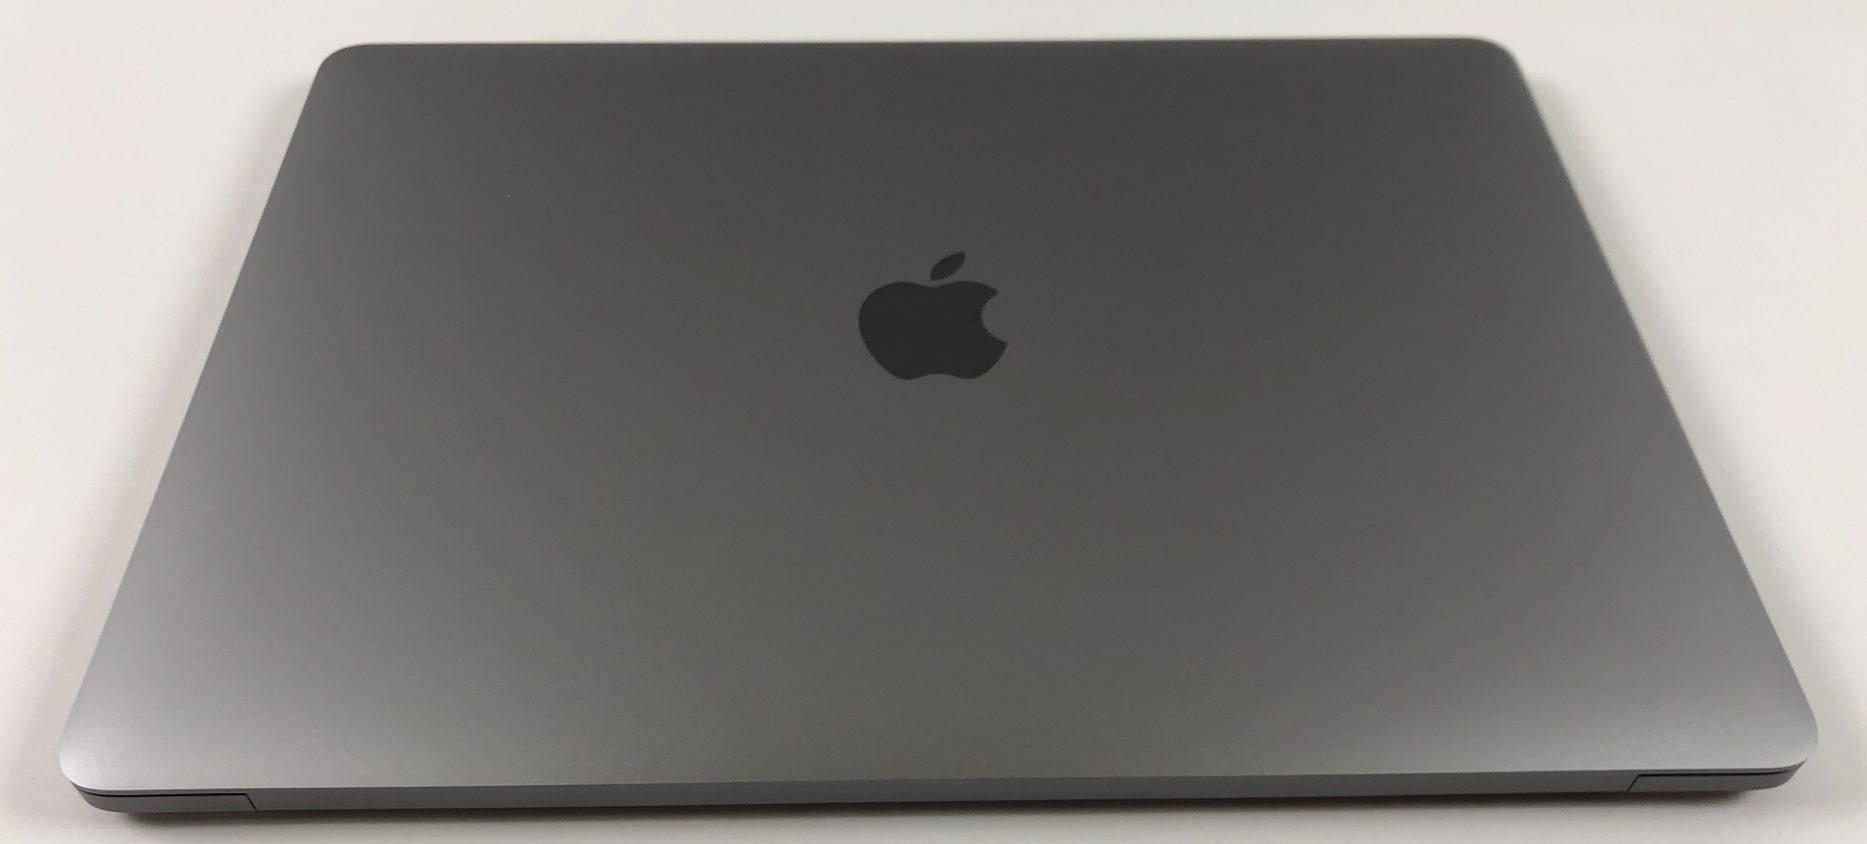 "MacBook Pro 13"" 2TBT Mid 2020 (Intel Quad-Core i5 1.4 GHz 8 GB RAM 256 GB SSD), Space Gray, Intel Quad-Core i5 1.4 GHz, 8 GB RAM, 256 GB SSD, imagen 2"